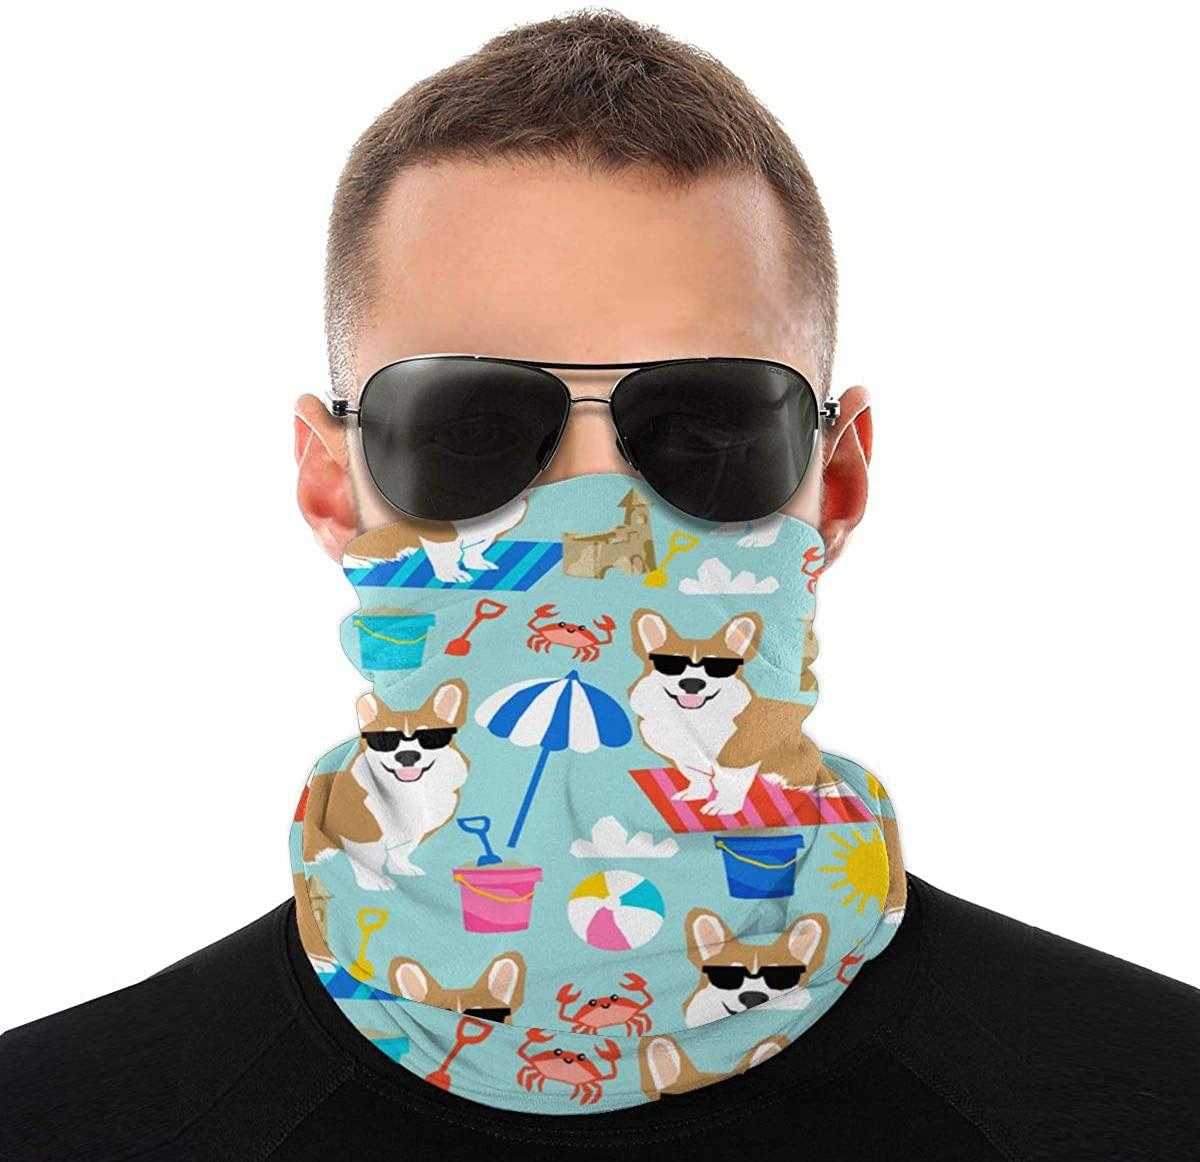 Corgi Face Scarf Neck Gaiter Tube Variety Head Scarf, Multifunctional Bandanas & Balaclava Anti Dust